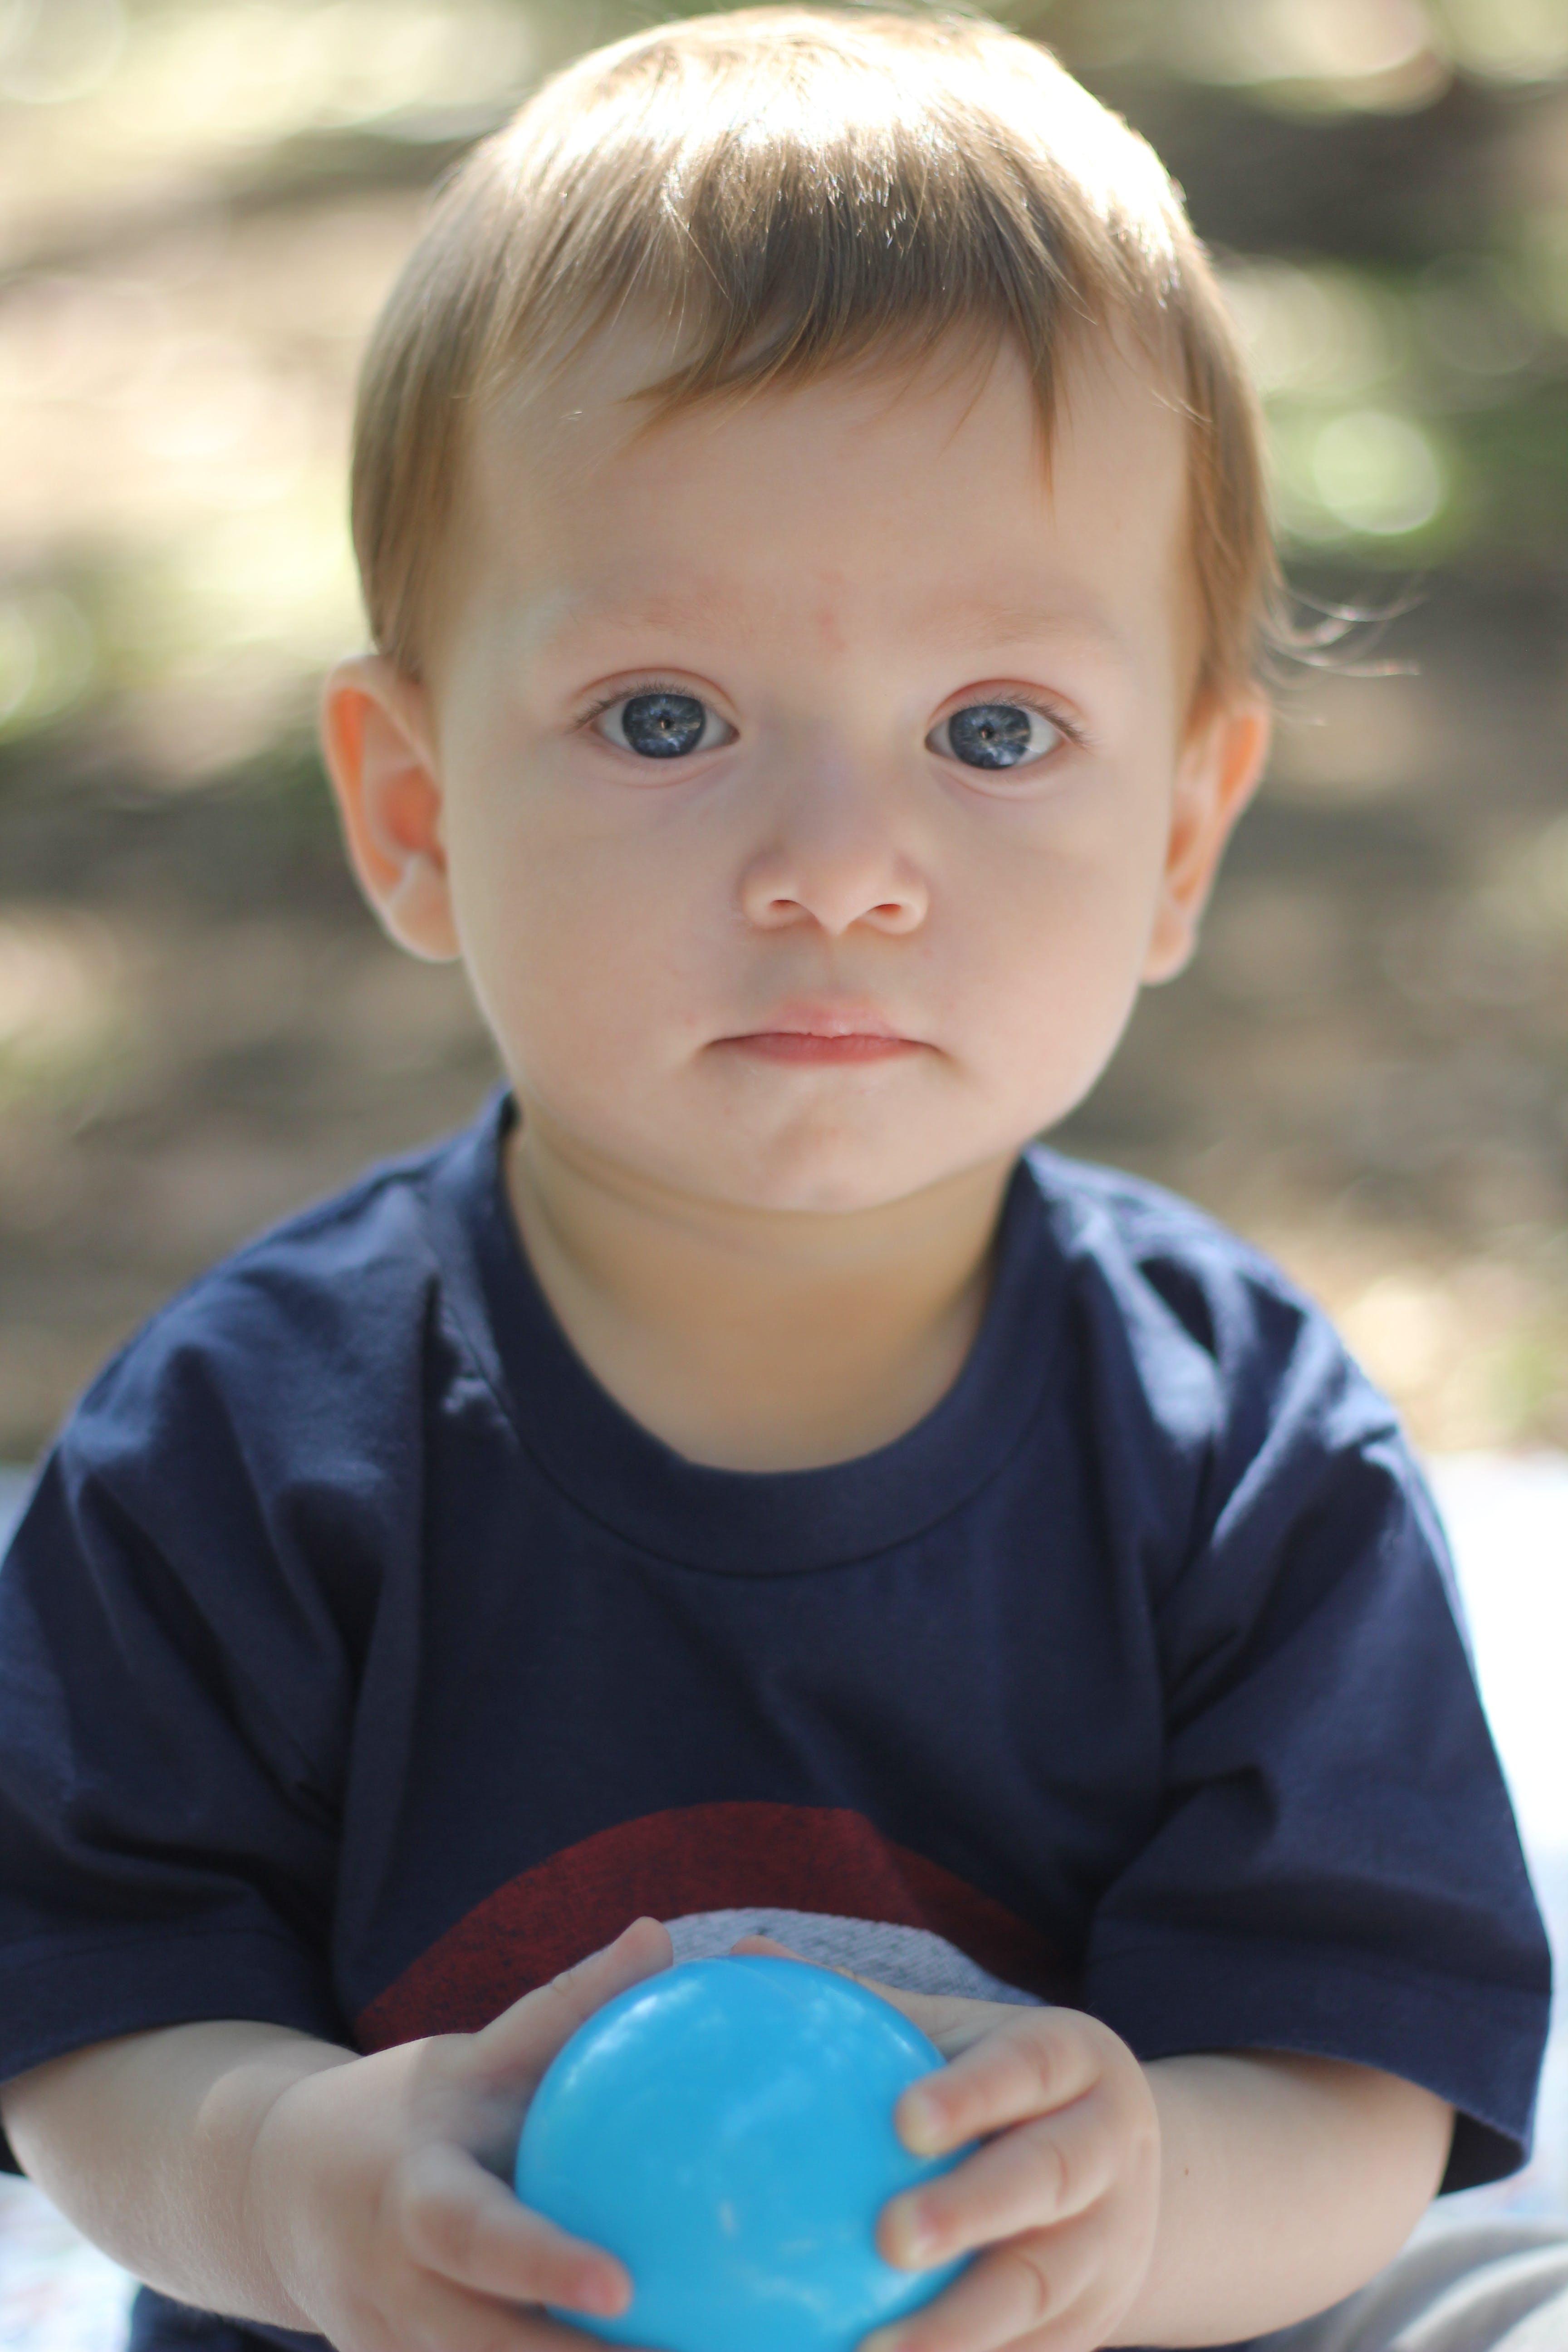 Free stock photo of blue, baby, children, baby boy